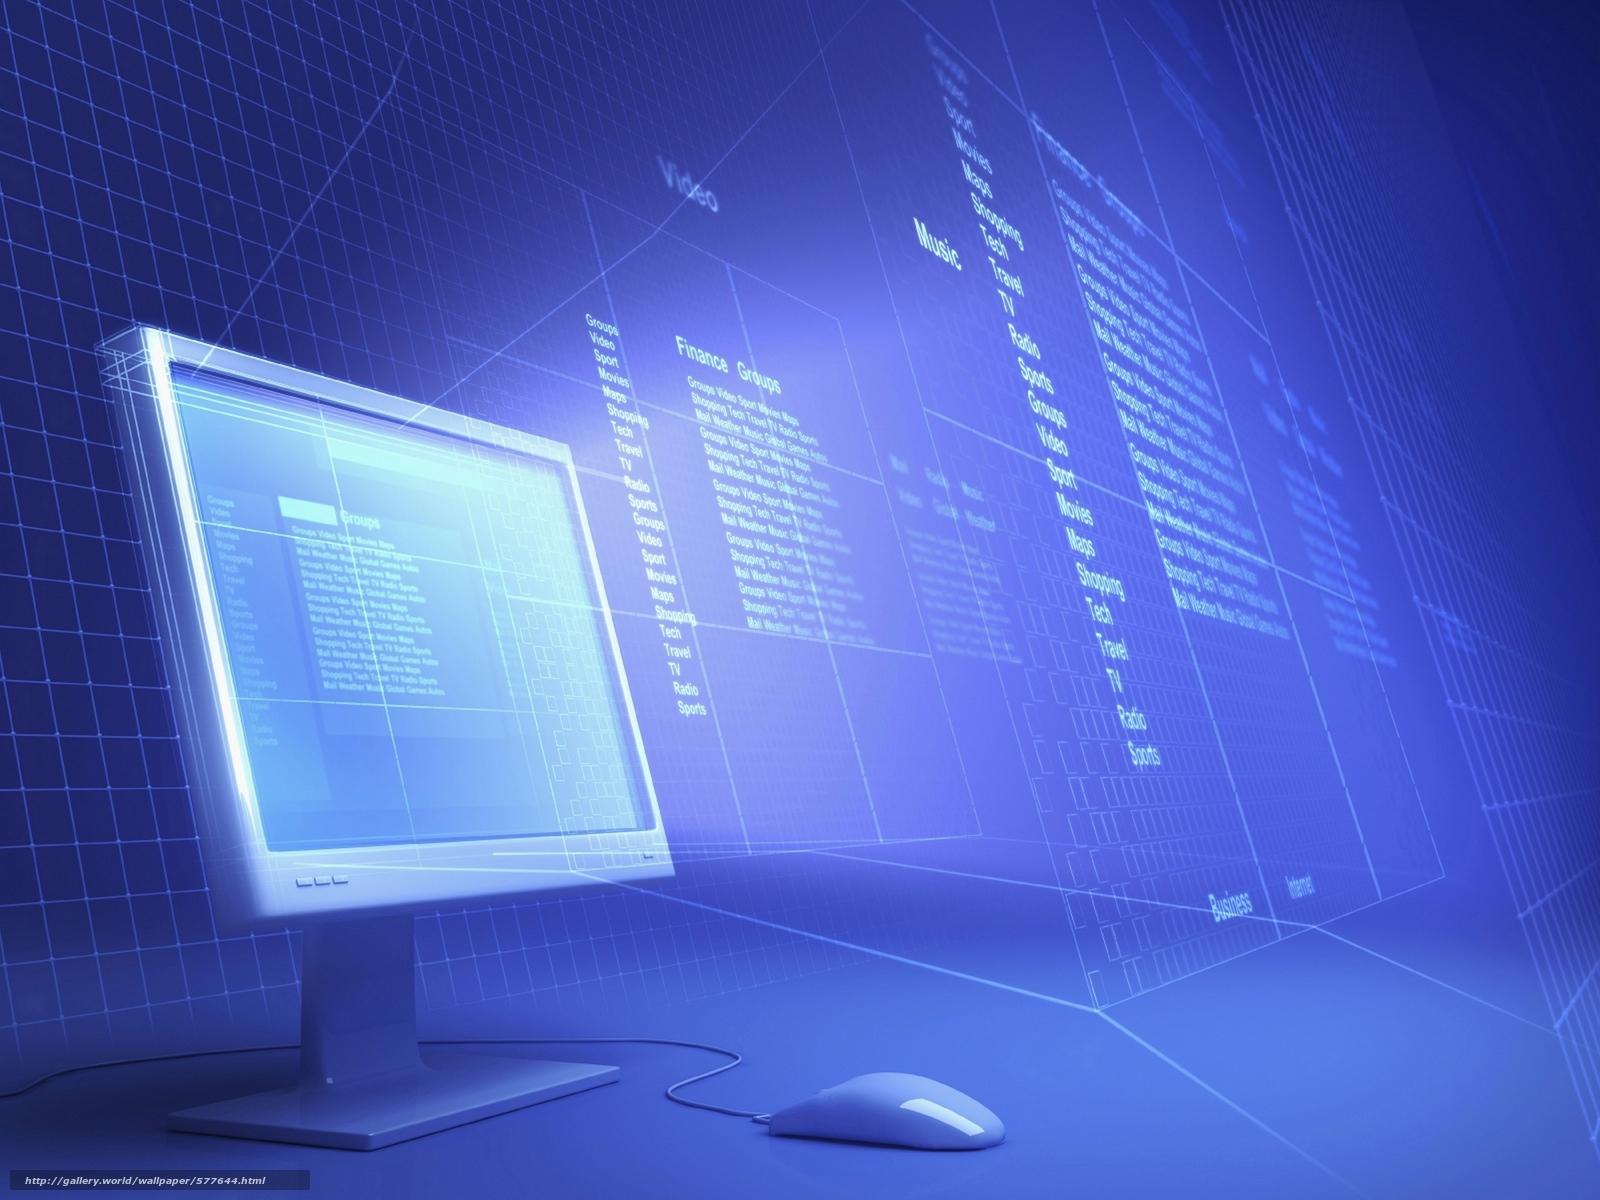 Download Wallpaper Computer Monitor Hi Tech Text Information Technology 1600x1200 Wallpaper Teahub Io